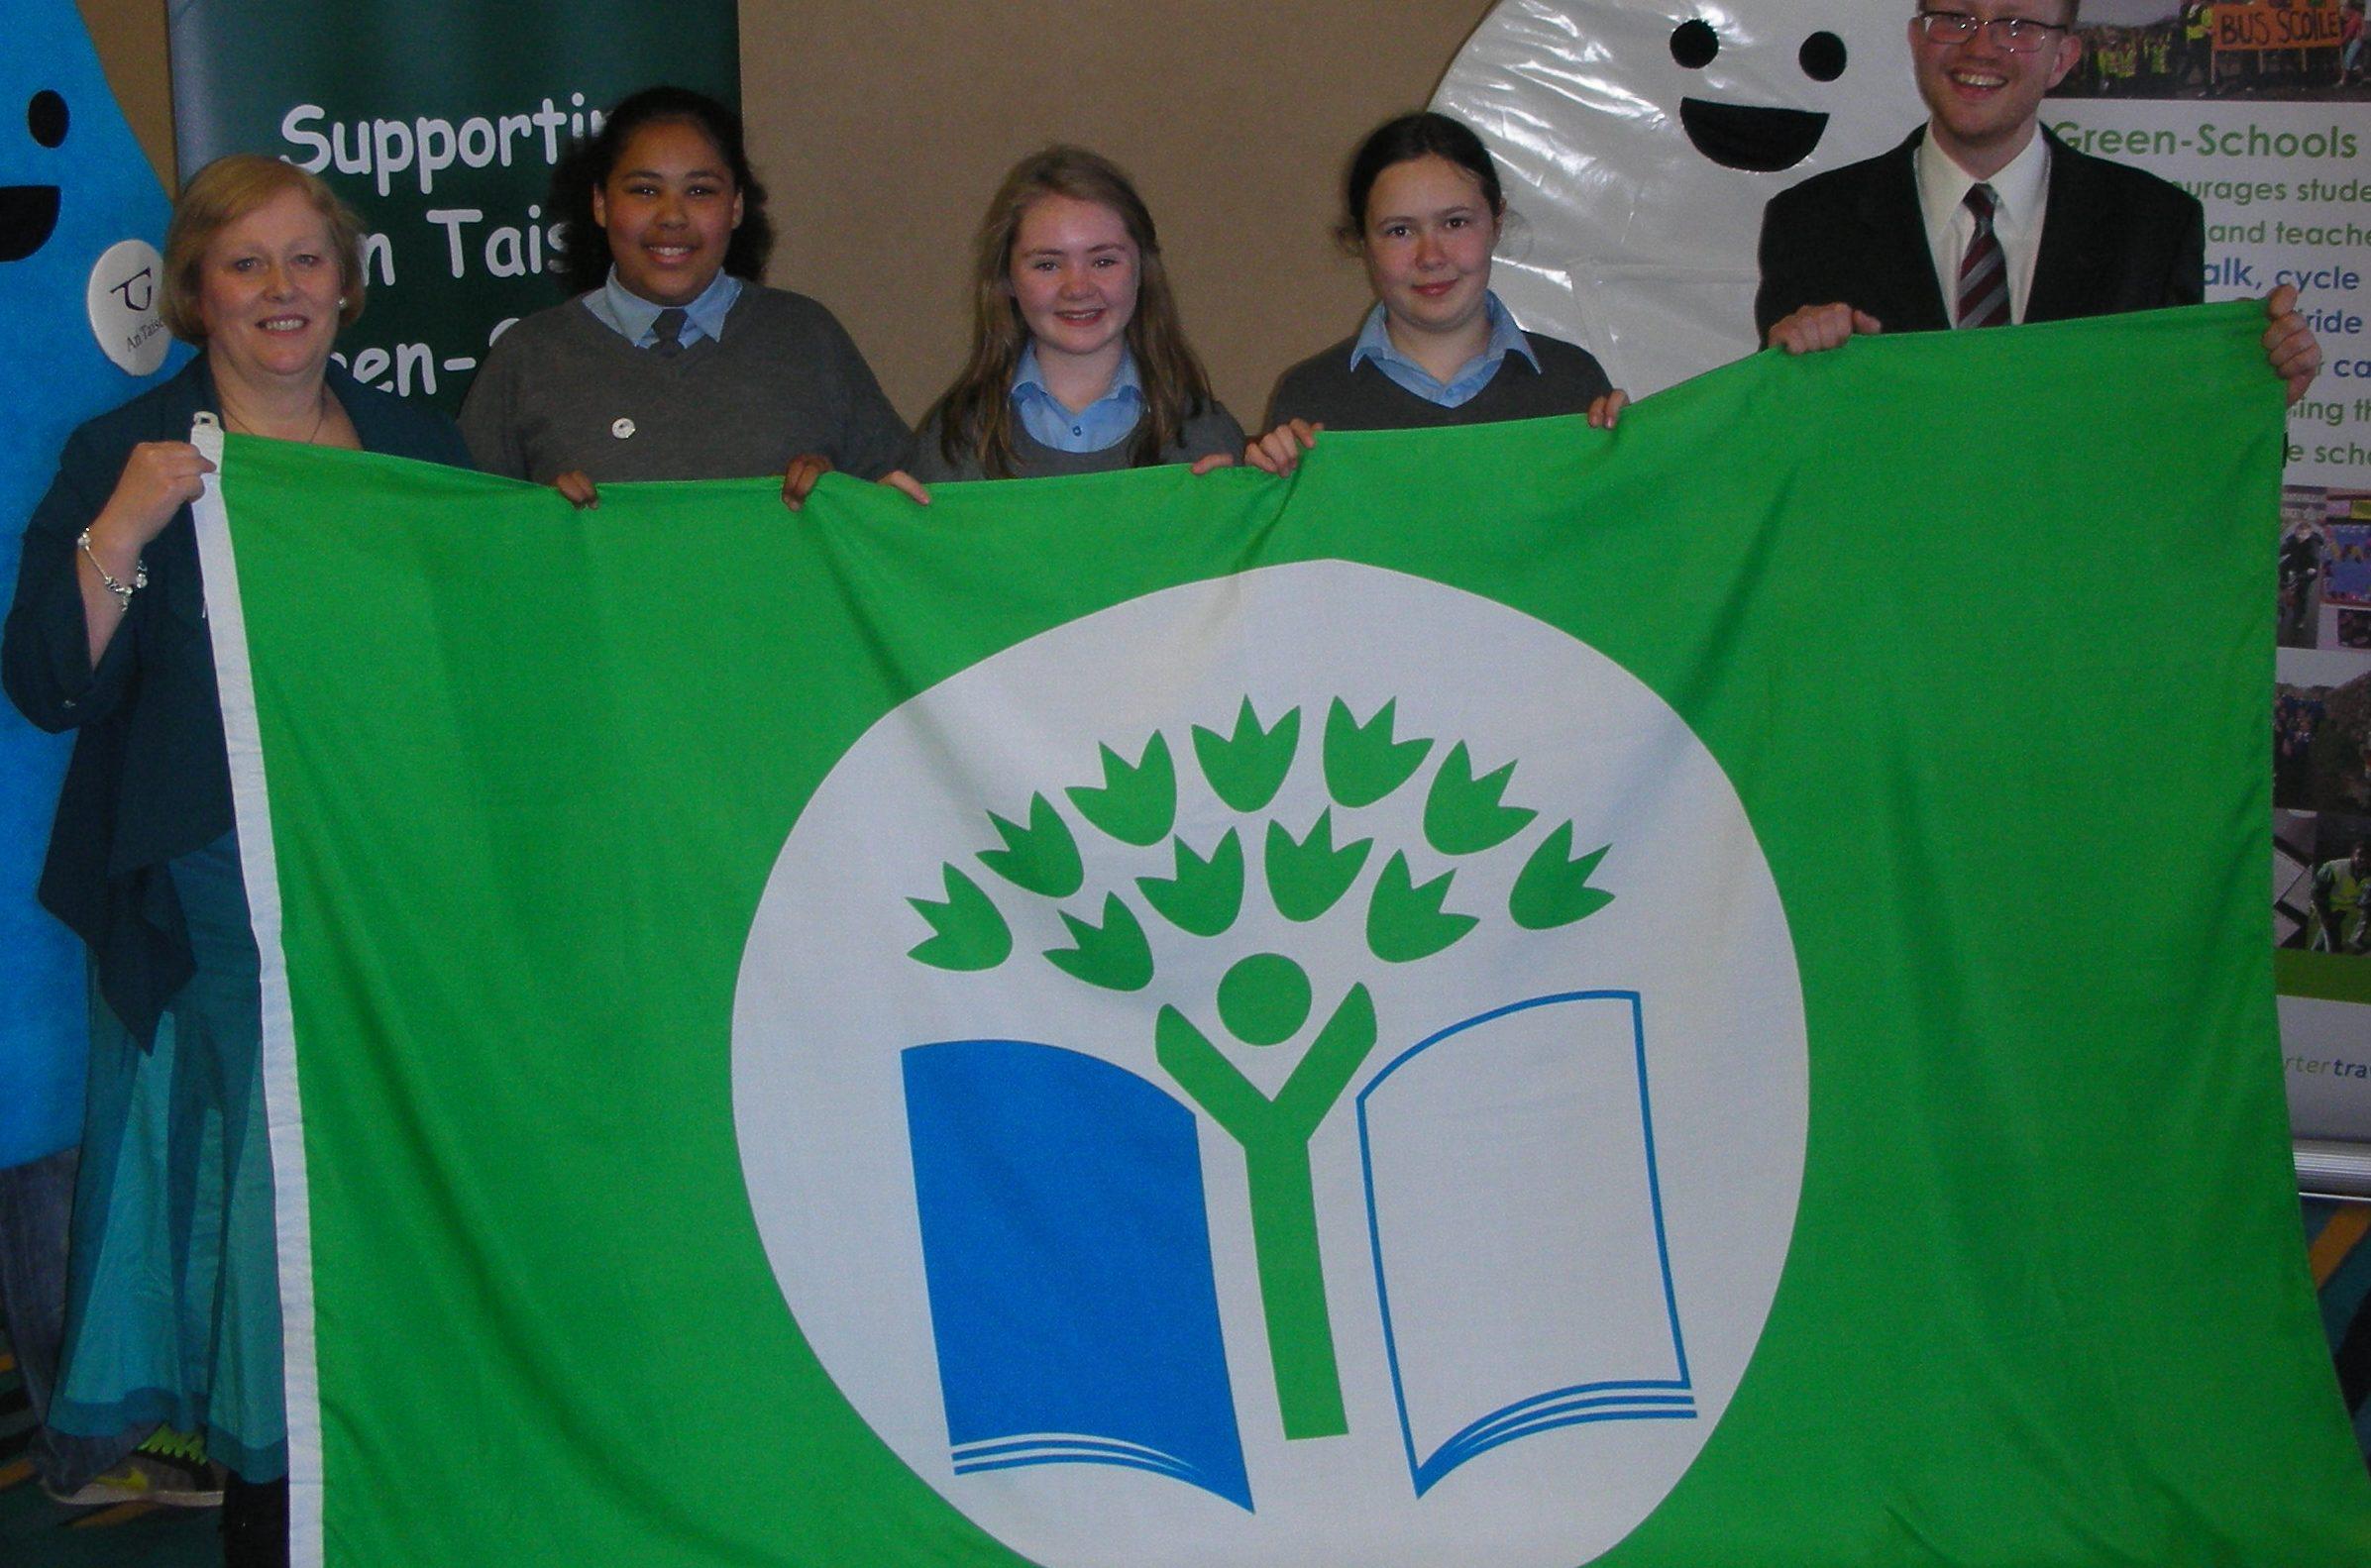 DSCN9200 e1534261596315 - Green Schools